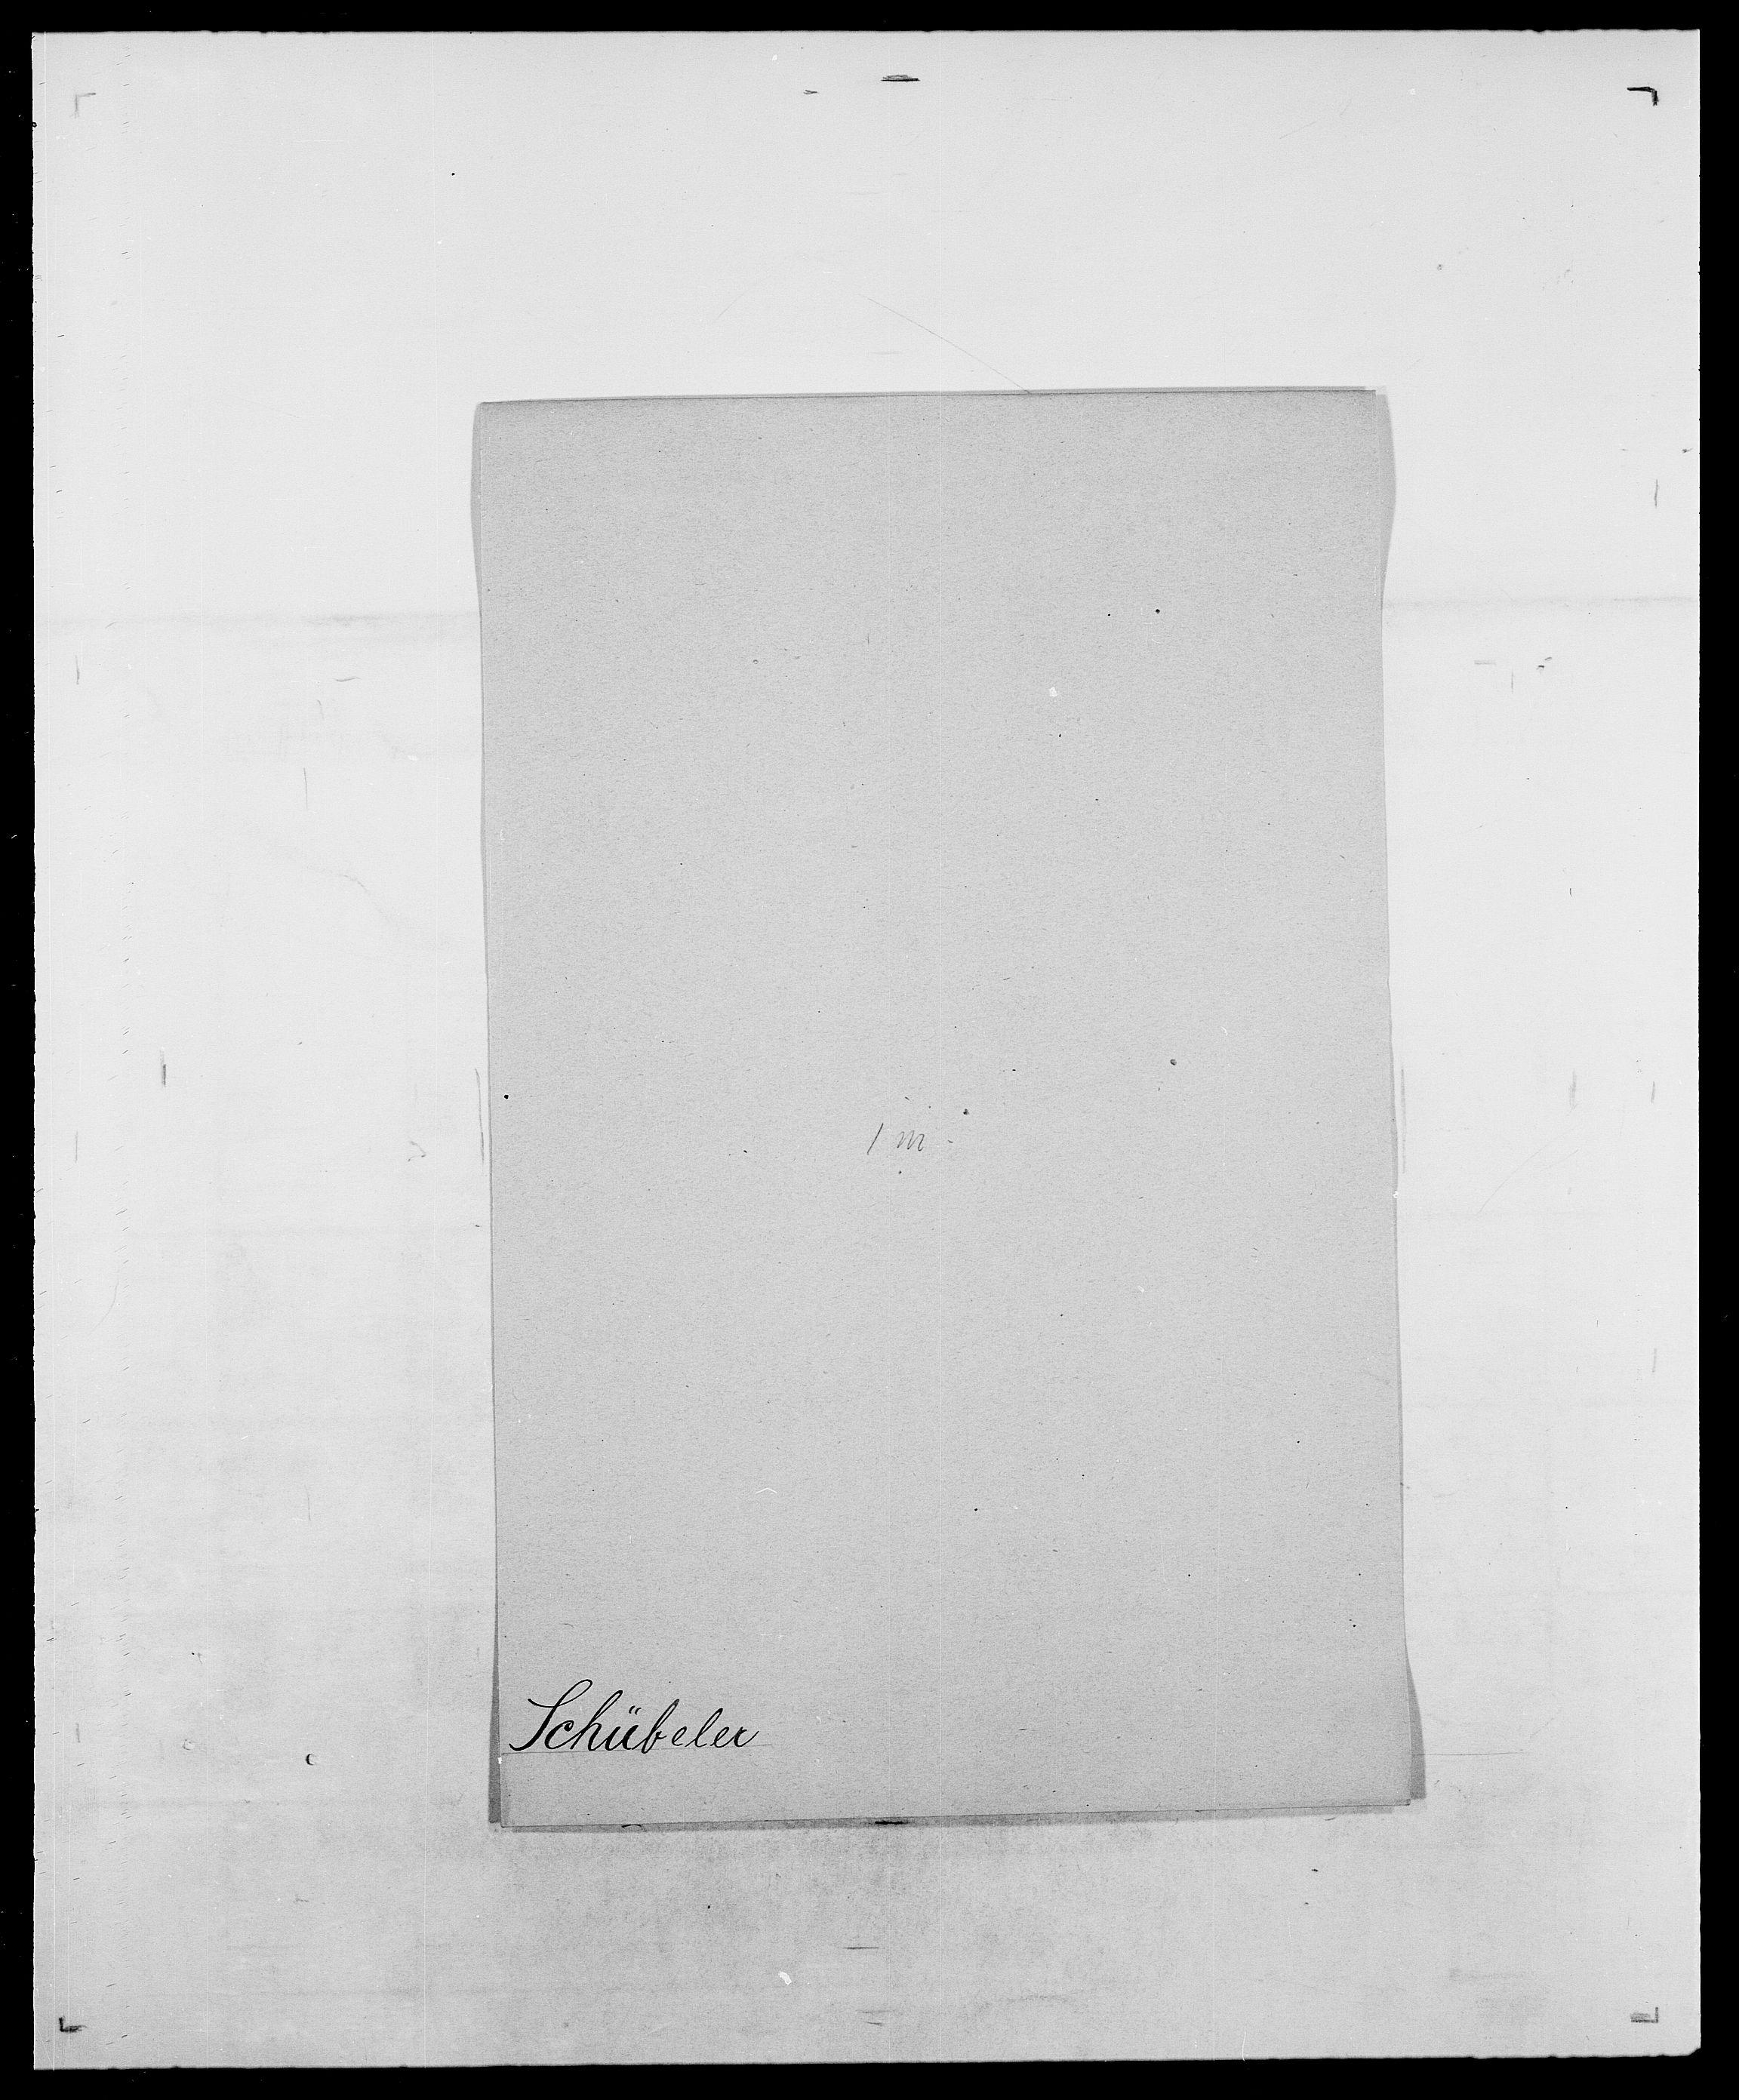 SAO, Delgobe, Charles Antoine - samling, D/Da/L0035: Schnabel - sjetman, s. 423